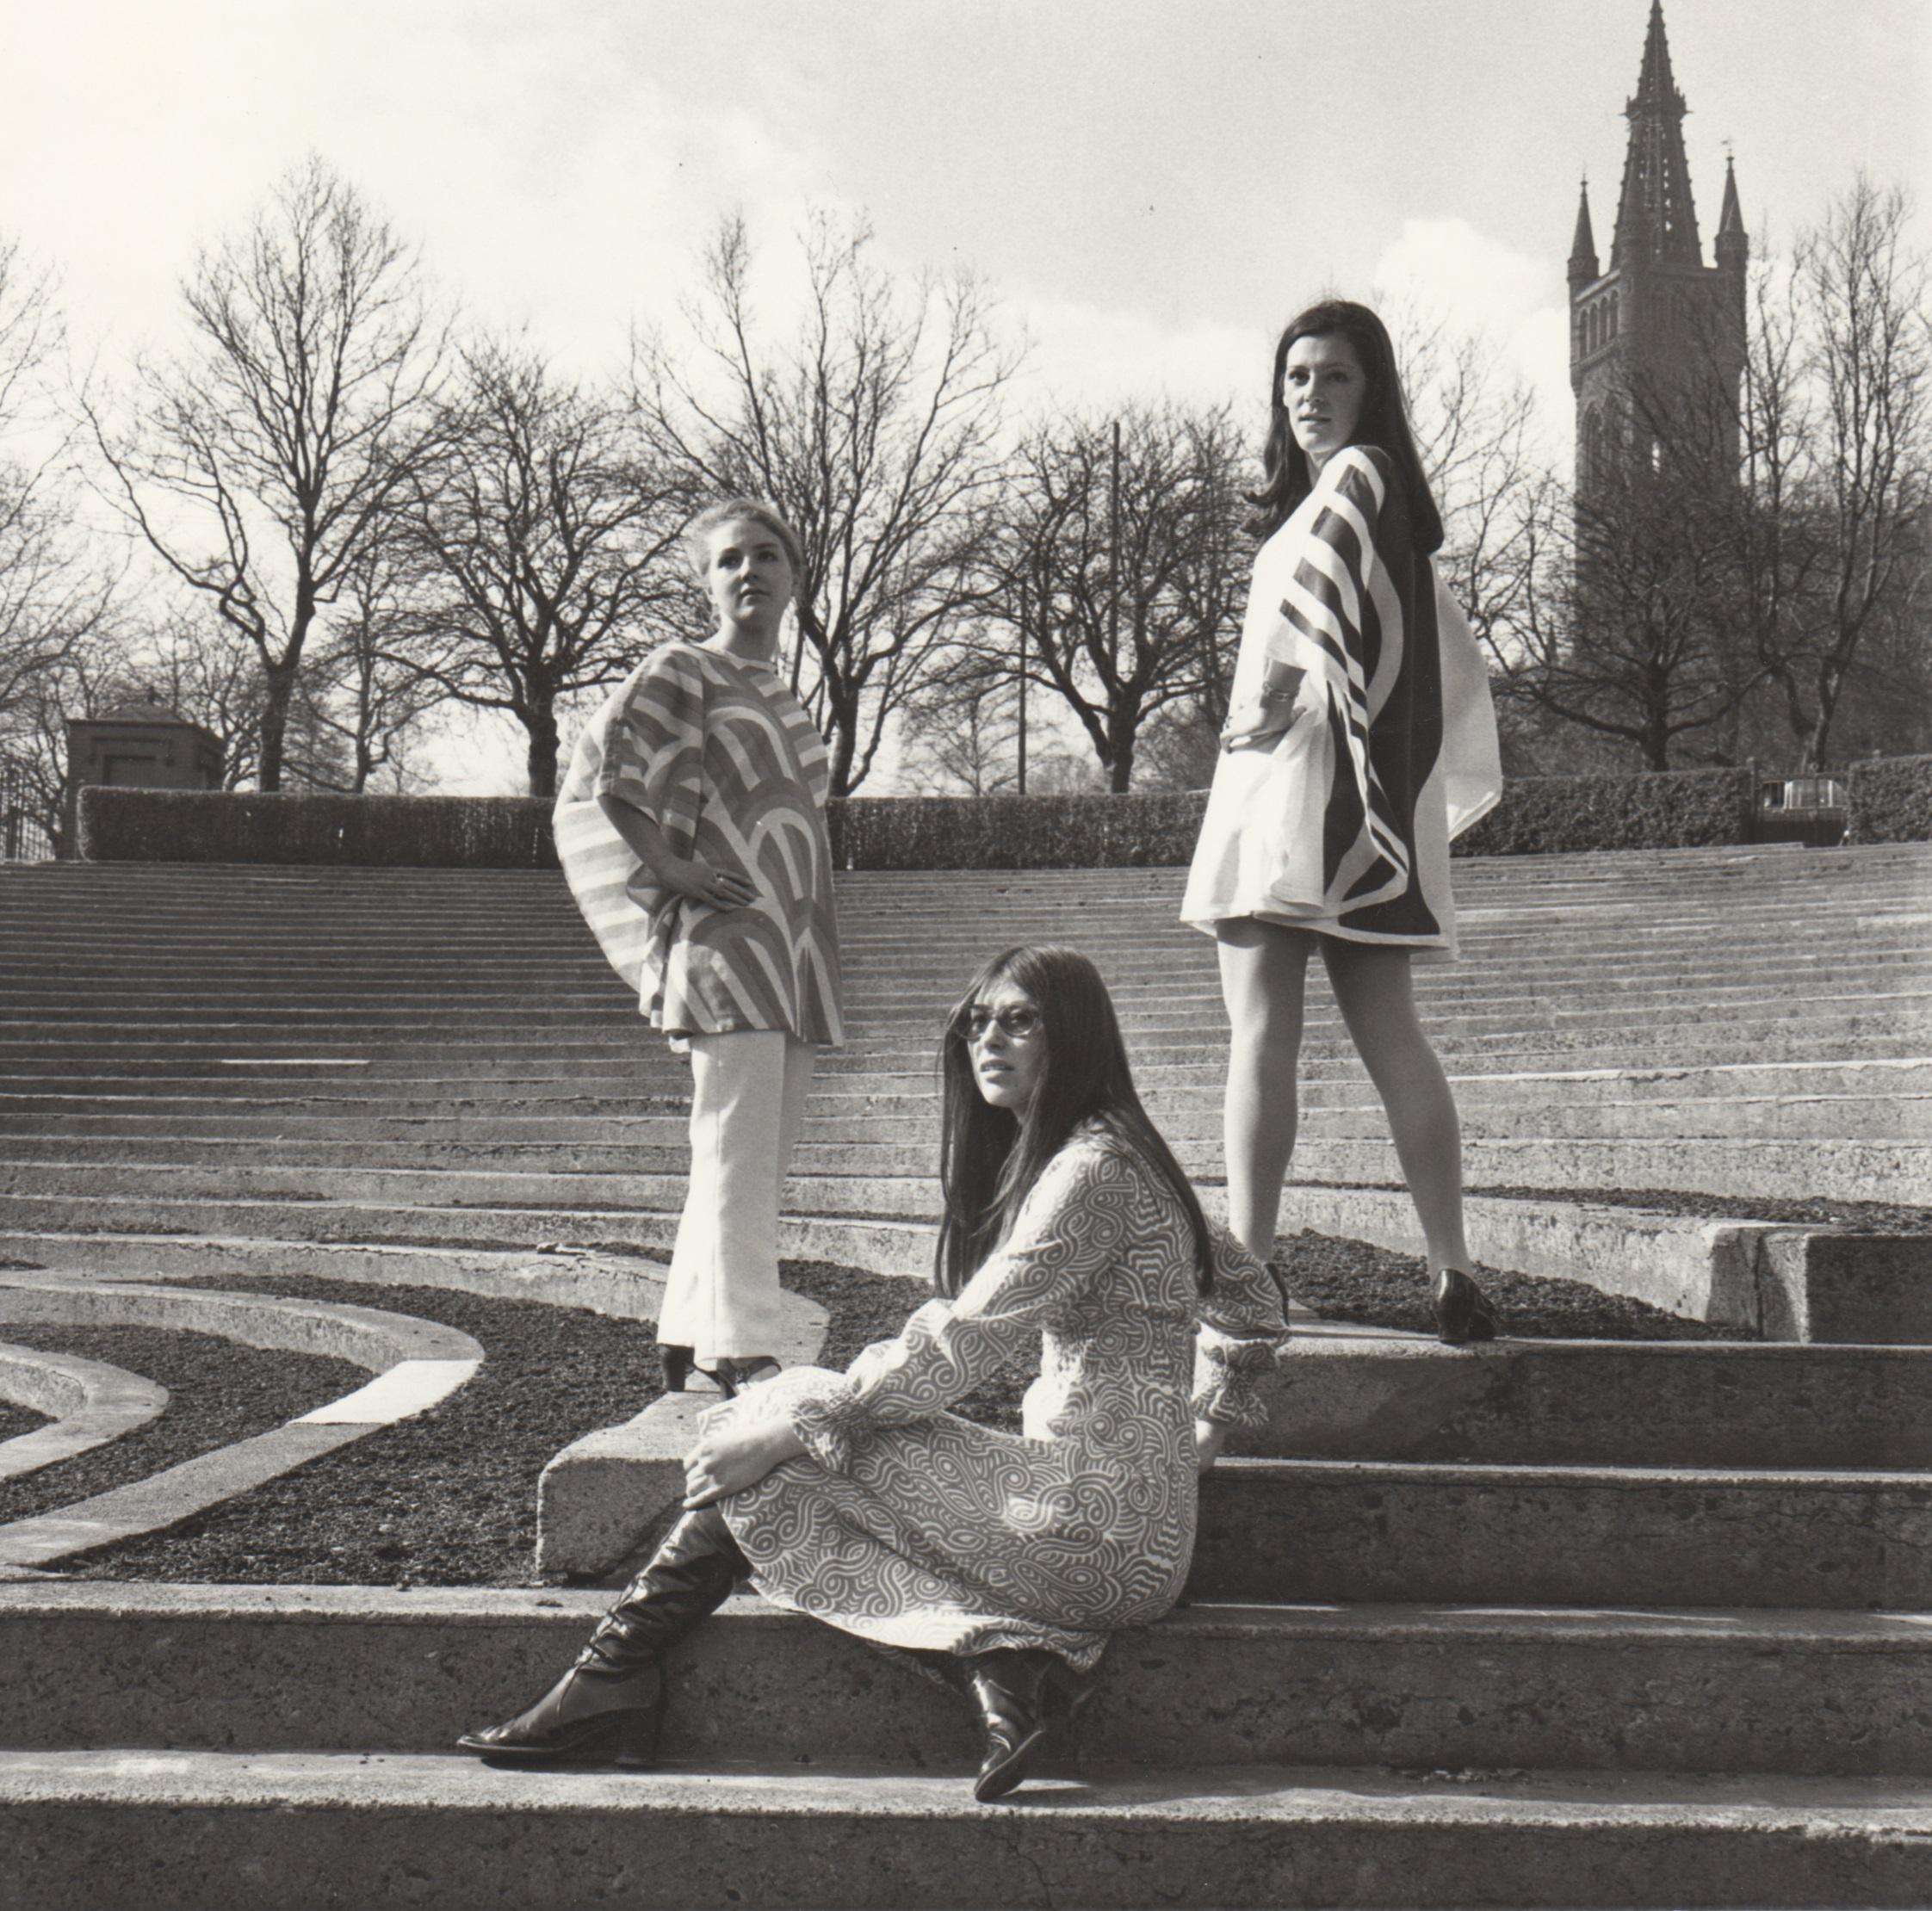 GSAA/P/1/2414 GSA students modelling fashion designs in Kelvingrove Park, 1960s